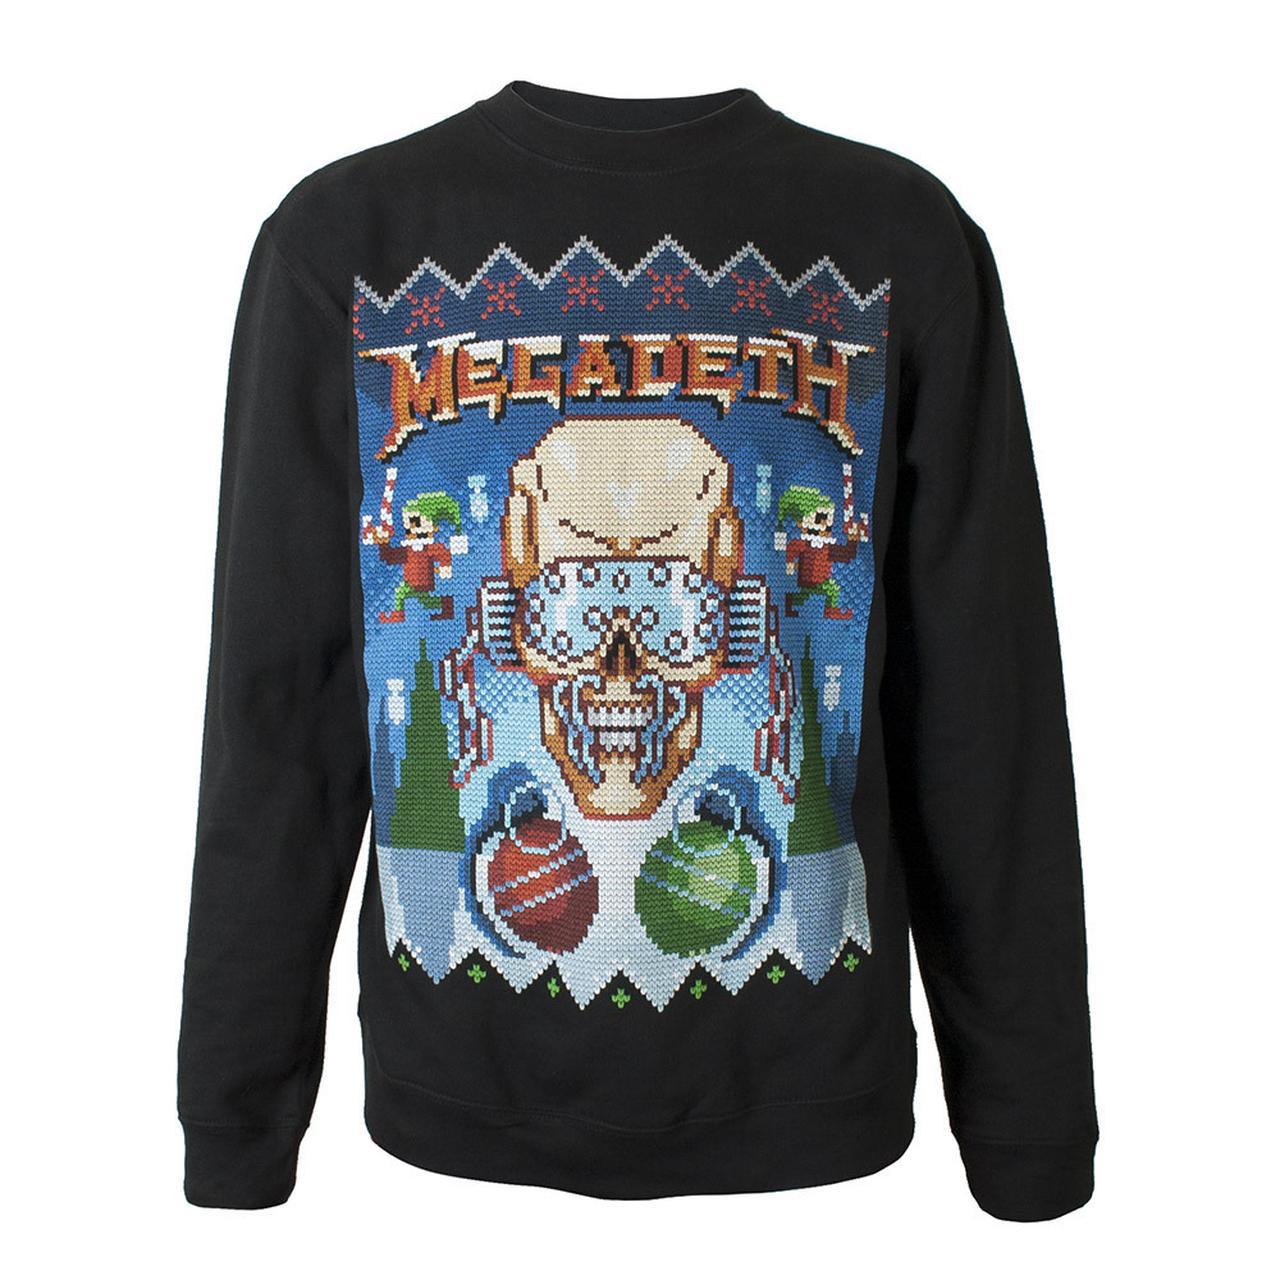 megadeth ugly megadeth christmas crewneck sweatshirt - Misfits Christmas Sweater